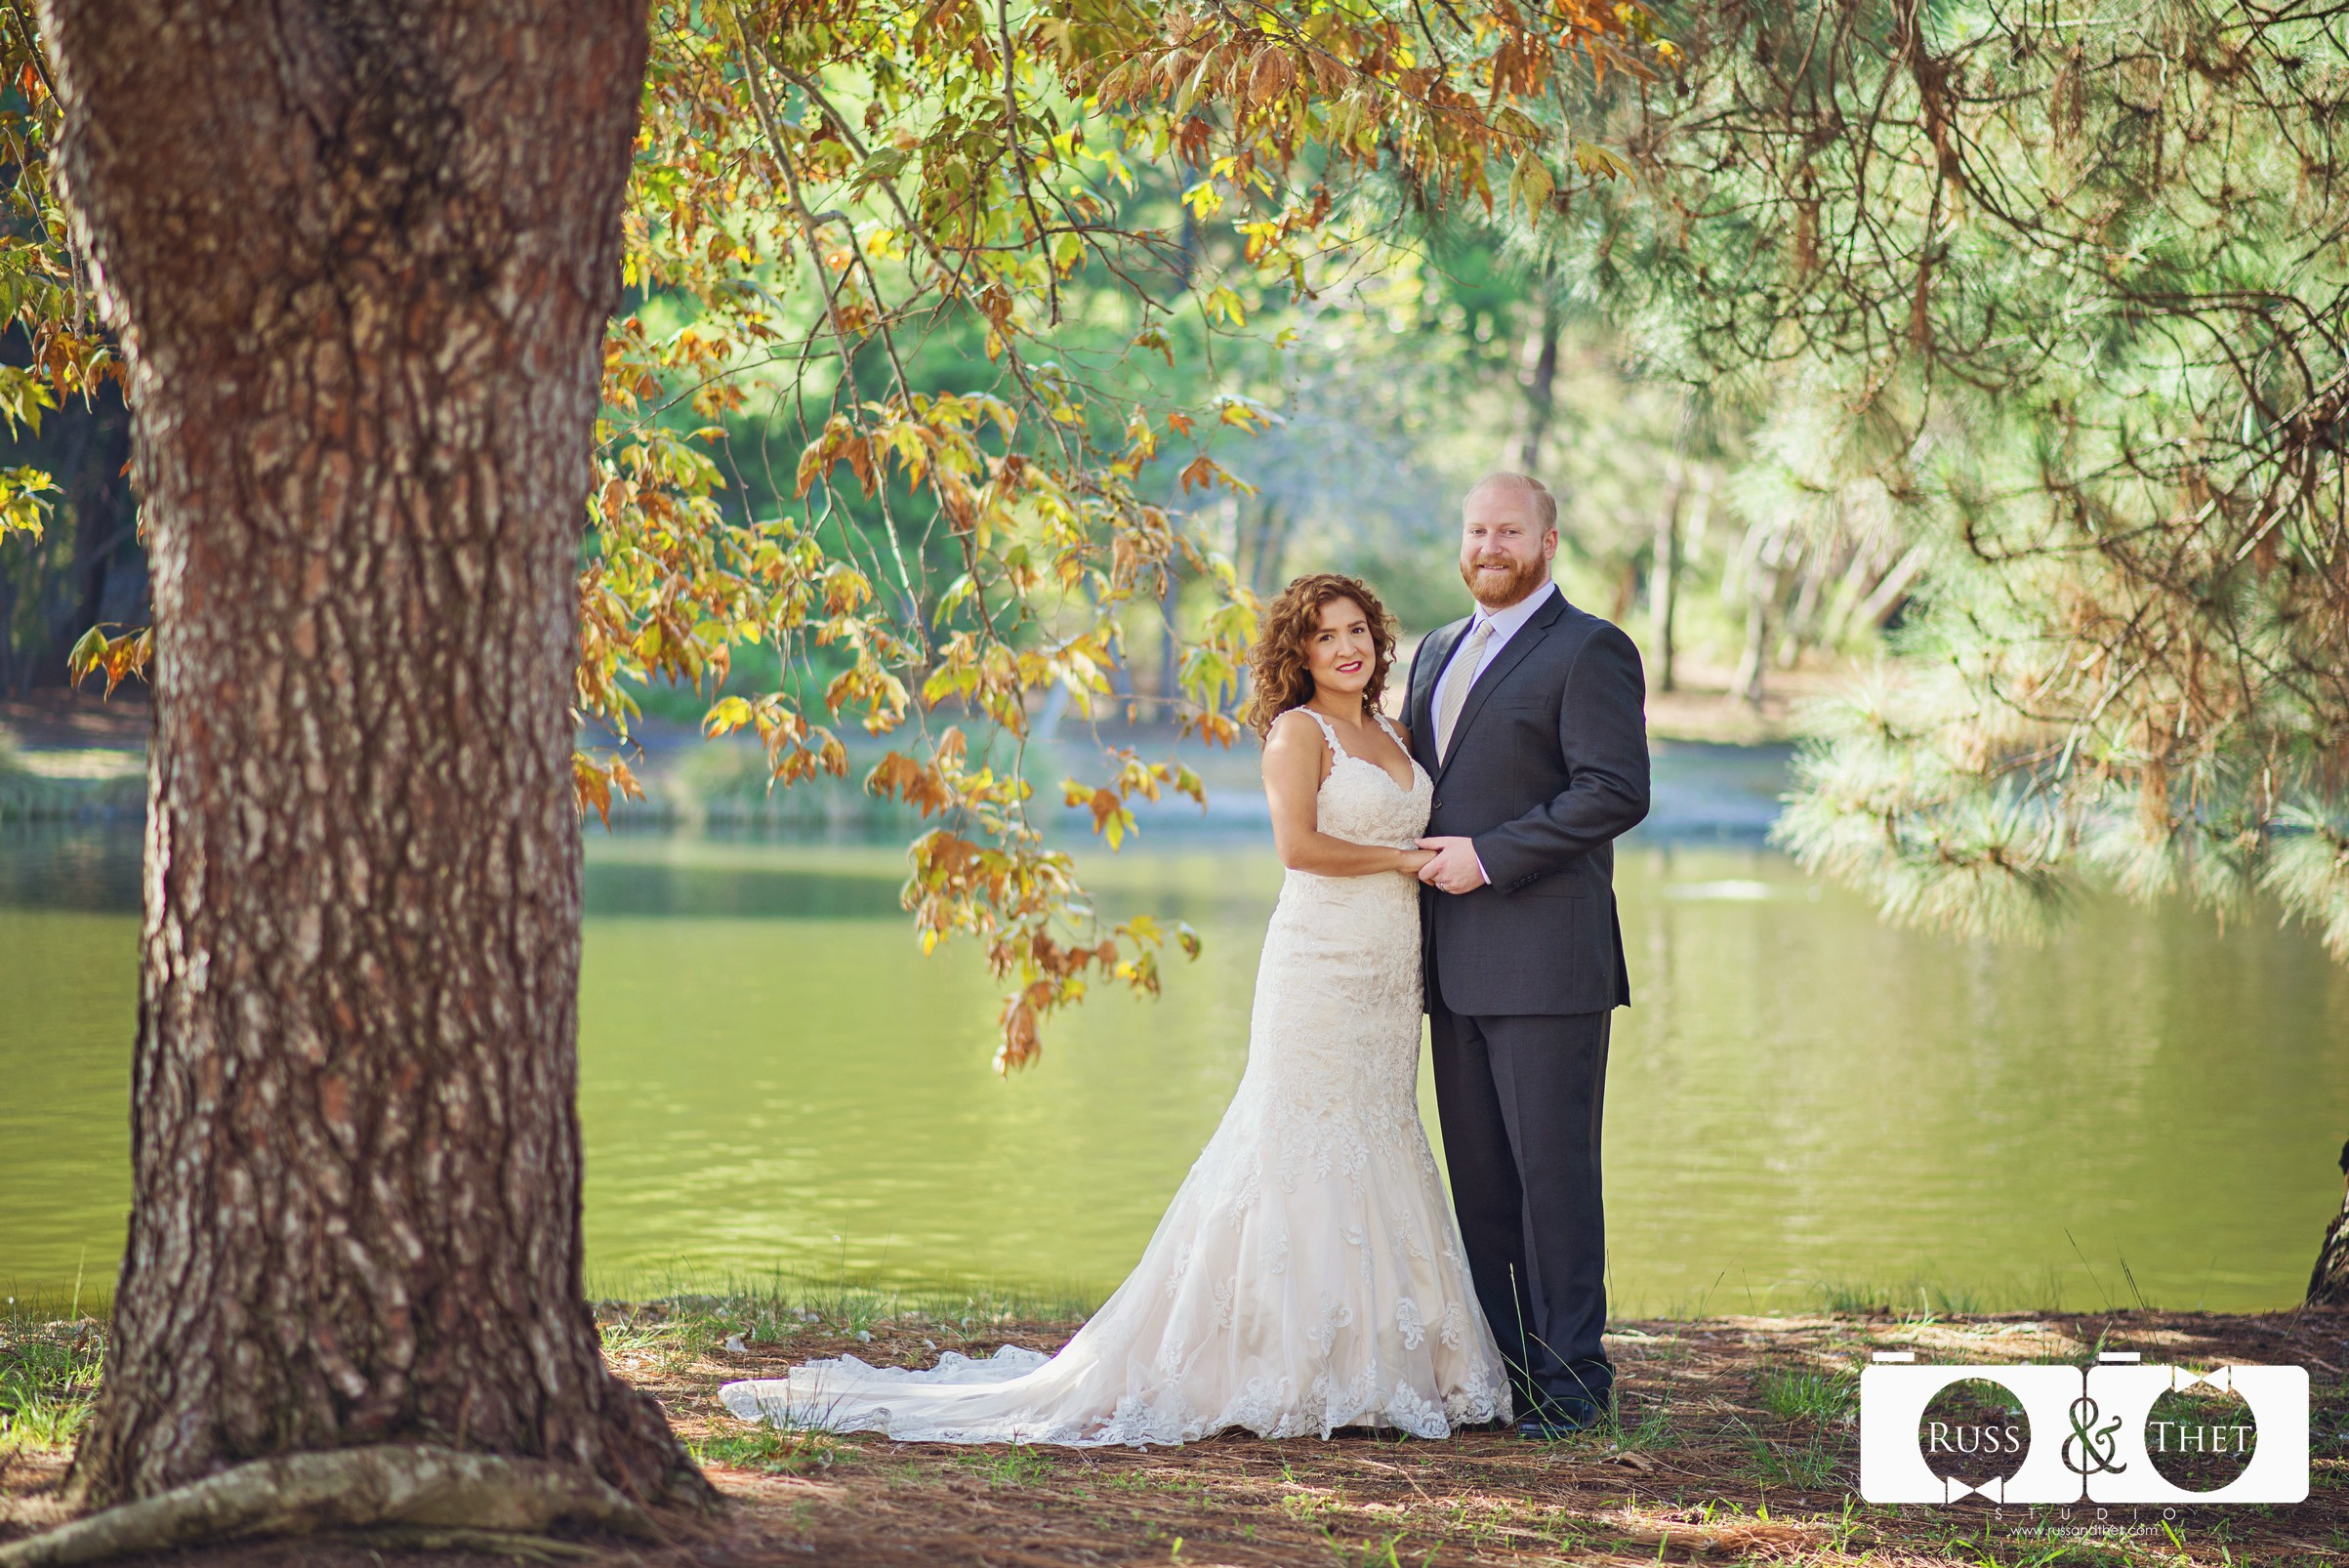 Andrew-and-Cristina-Yorba-Park-Wedding-Photographers (2).jpg